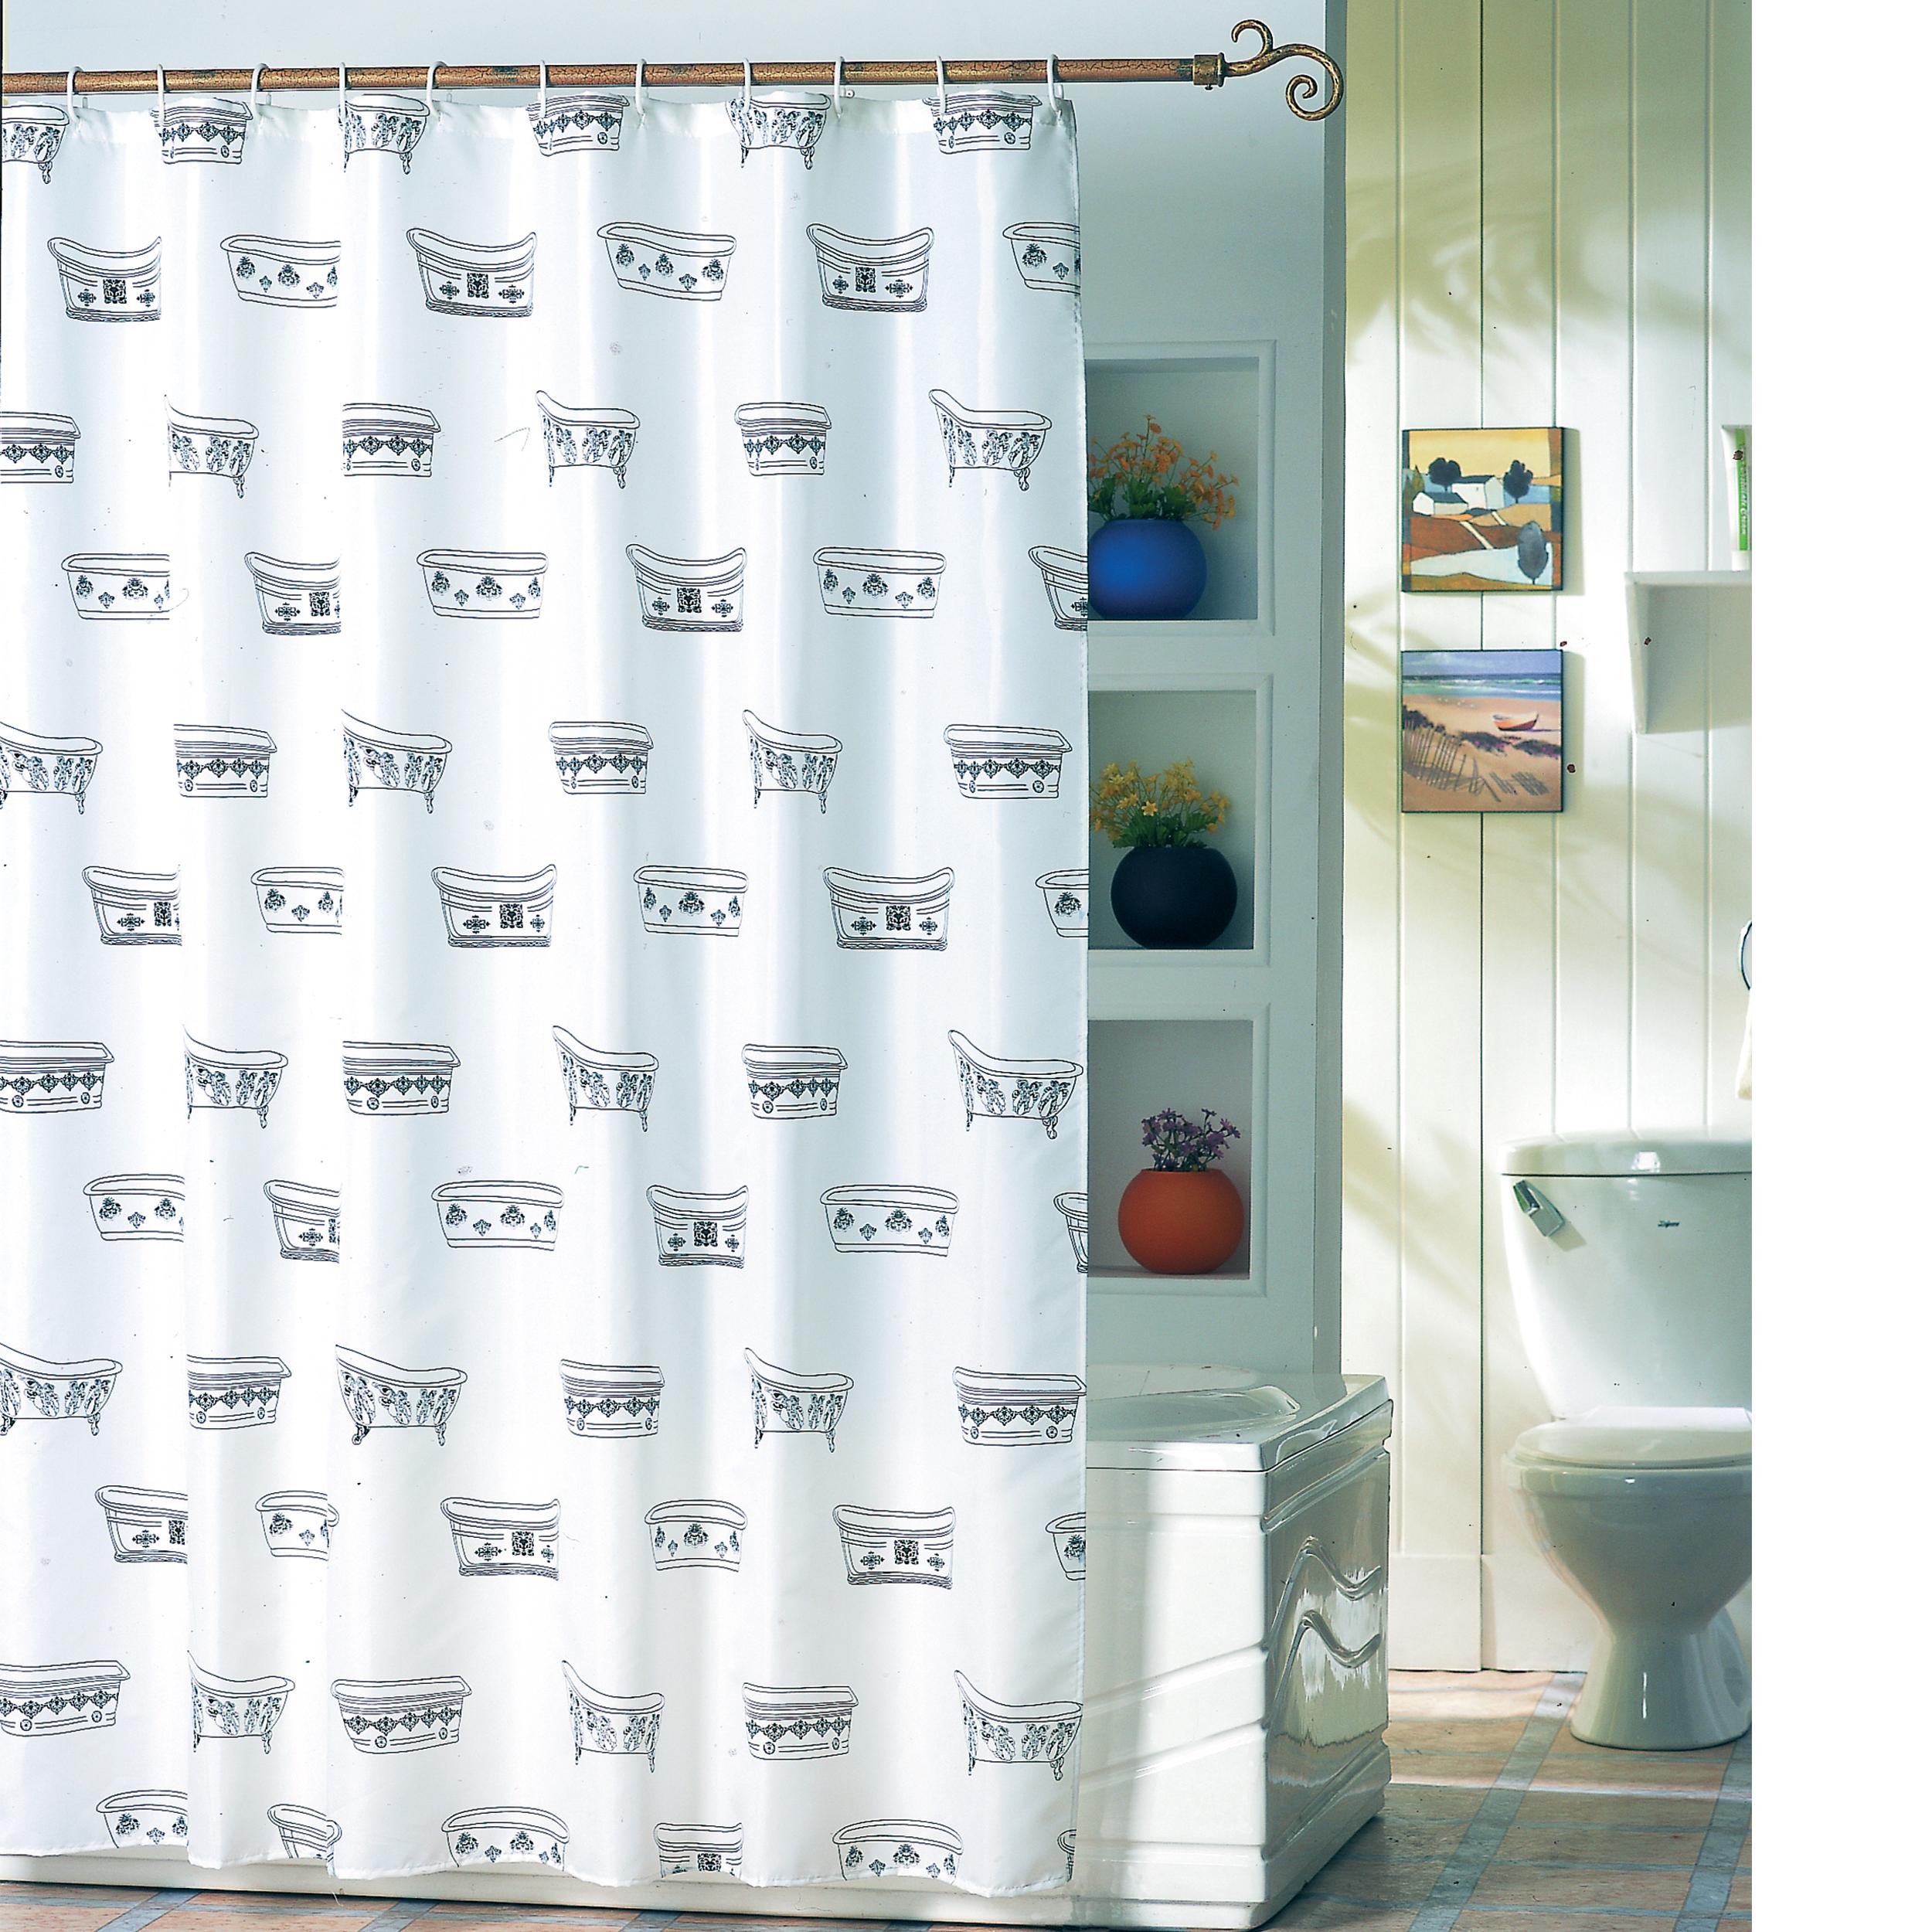 MSV Duschvorhang 180x200cm Anti Schimmel Textil Badewannenvorhang Wannenvorhang Badewanne